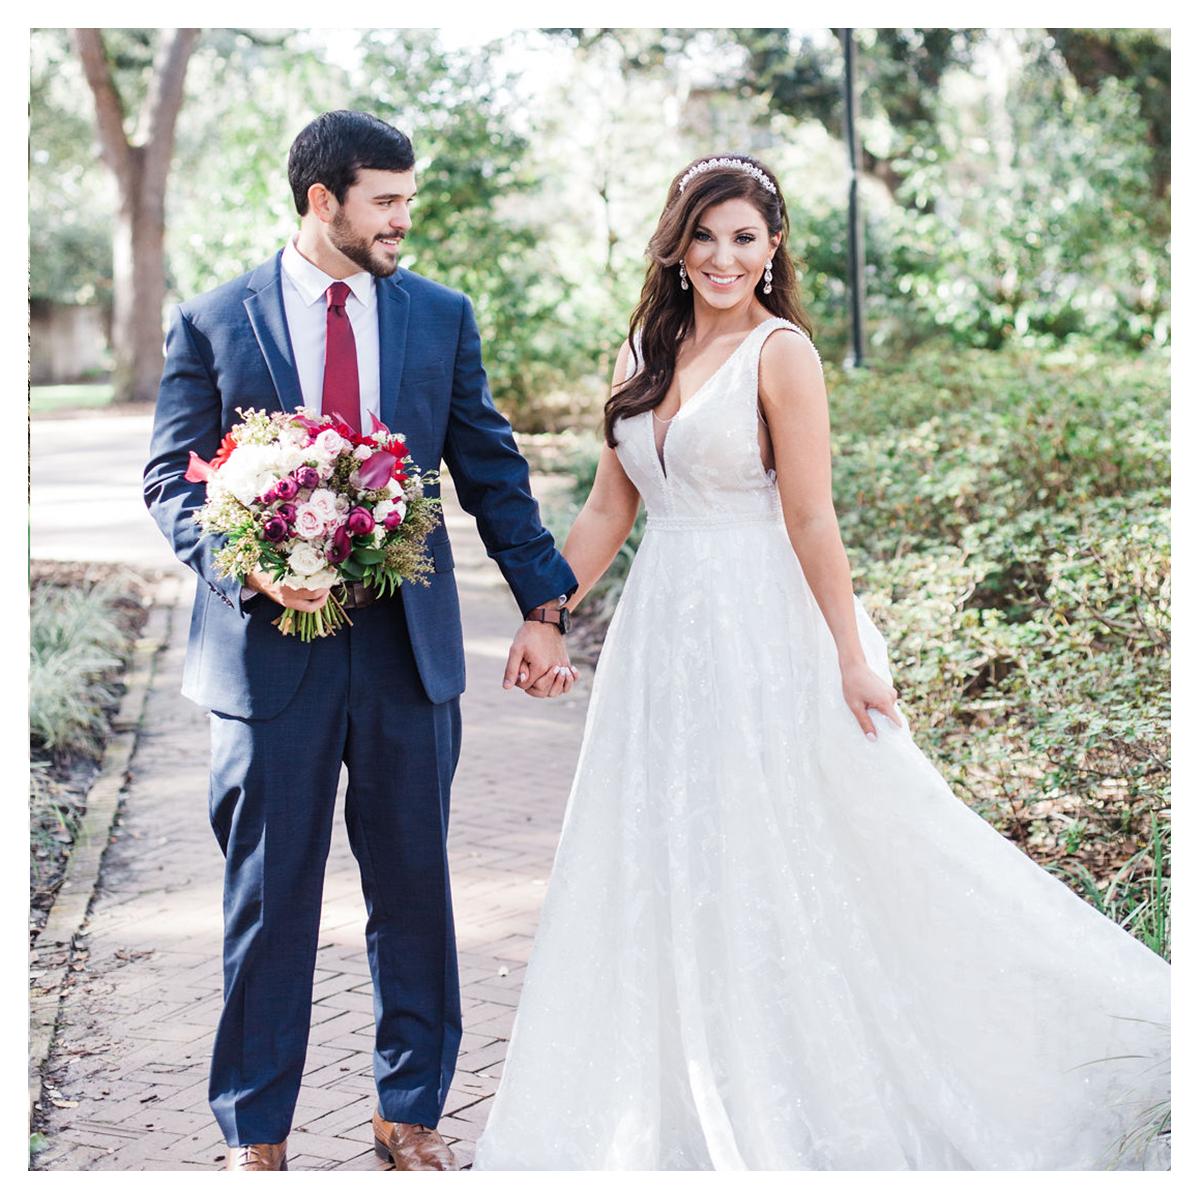 lindsey-shawn-savannah-elopement-apt-b-photo-savannah-elopement-photographer-savannah-wedding-photorapher-savannah-weddings-savannah-elopements.png